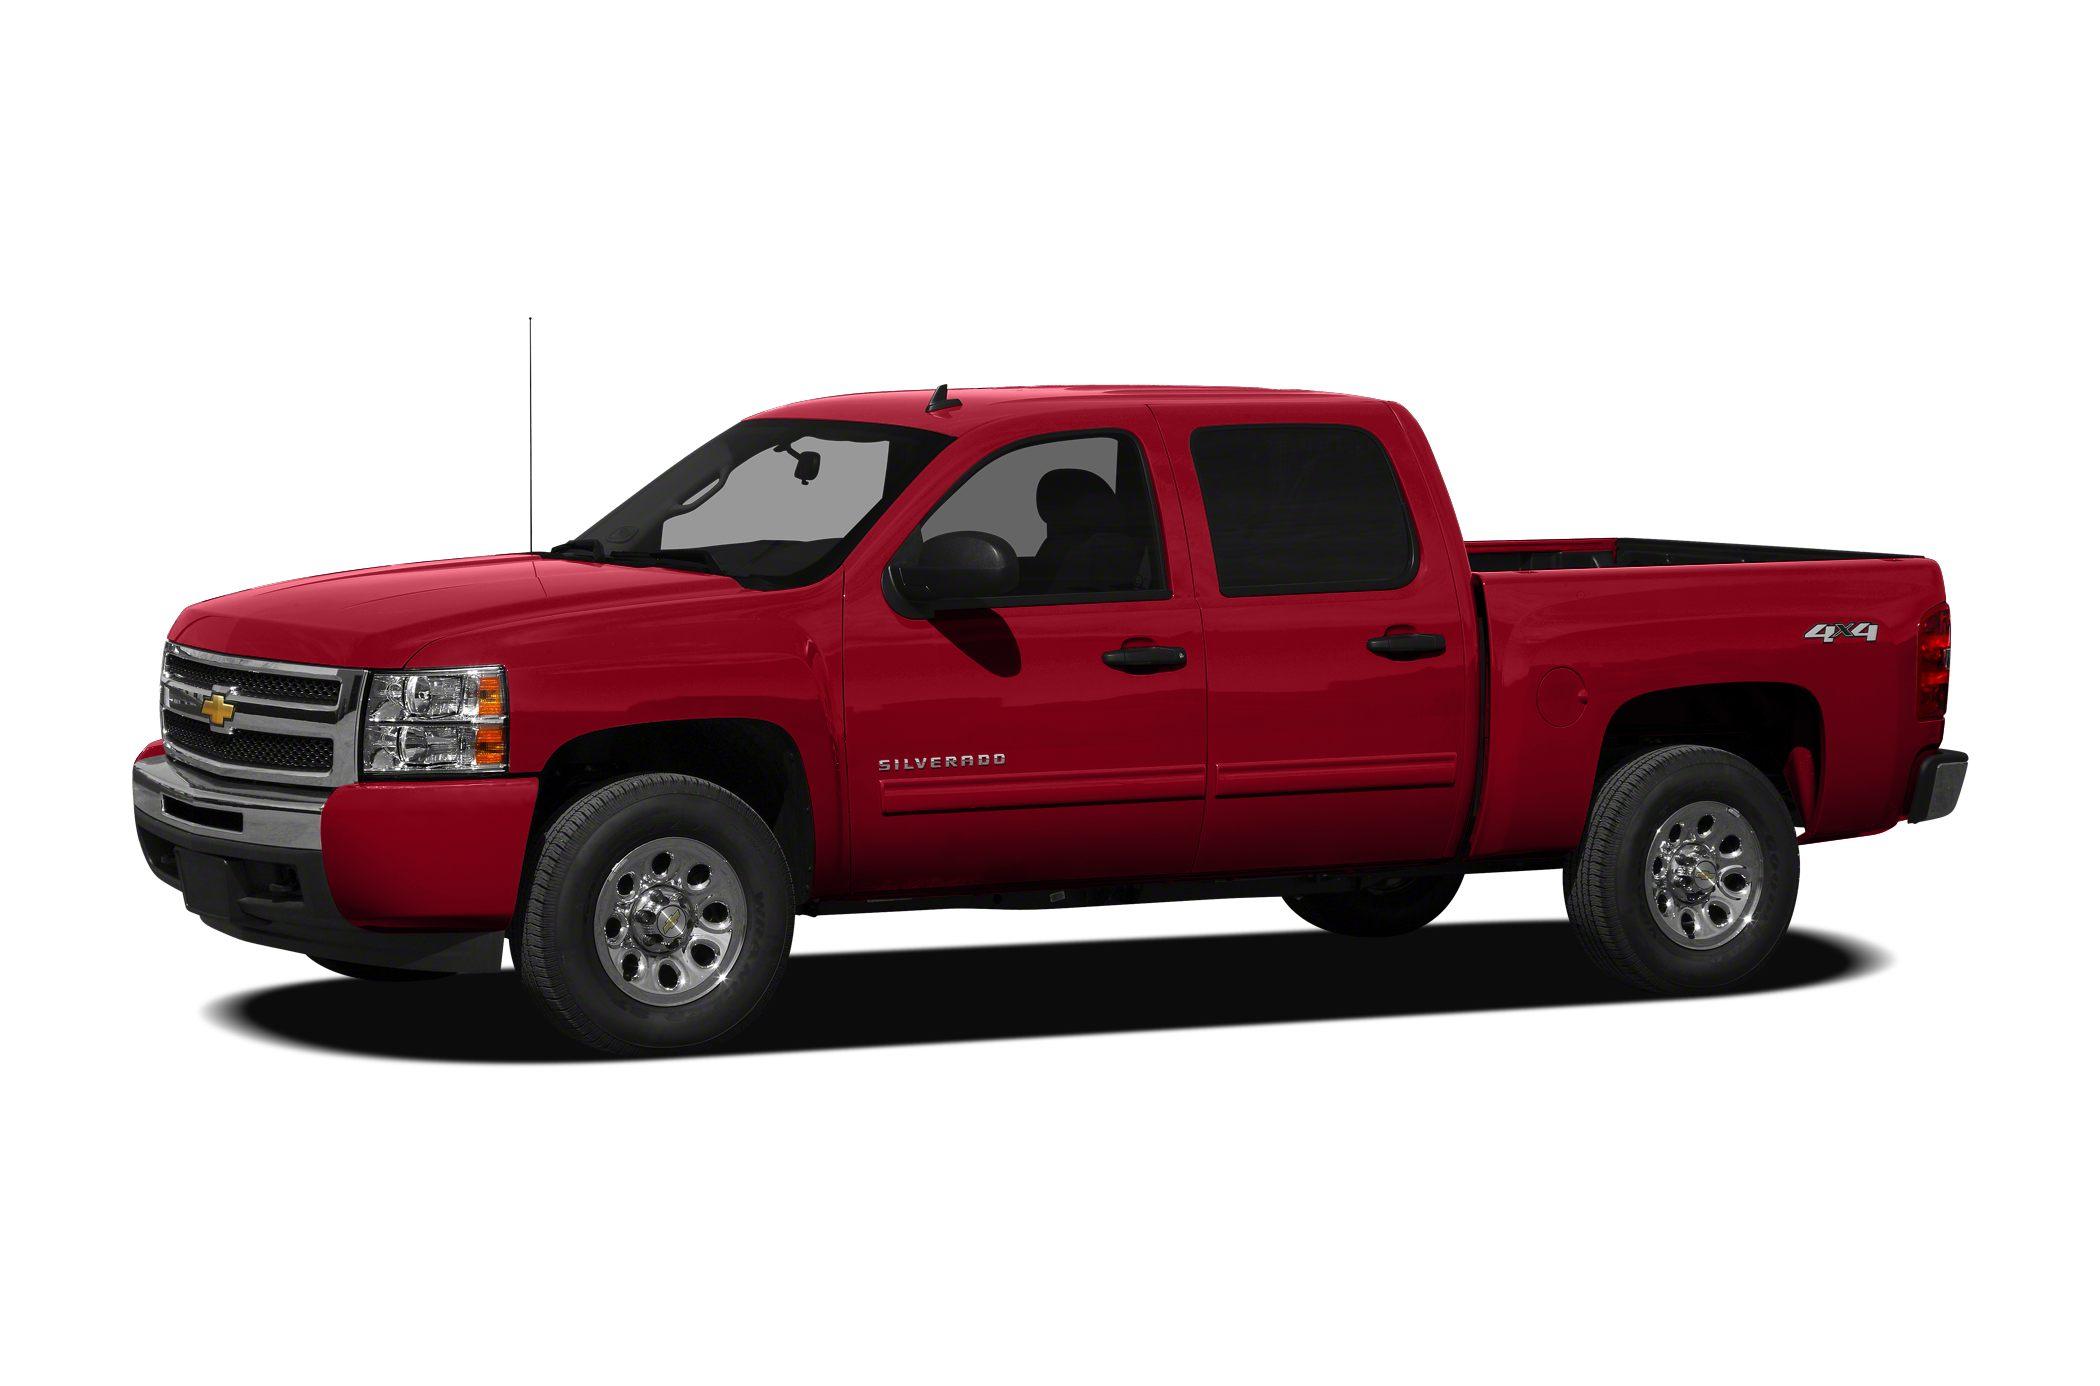 2012 Chevrolet Silverado 1500 Ltz 4x4 Crew Cab 5 75 Ft Box 143 5 In Wb Pictures